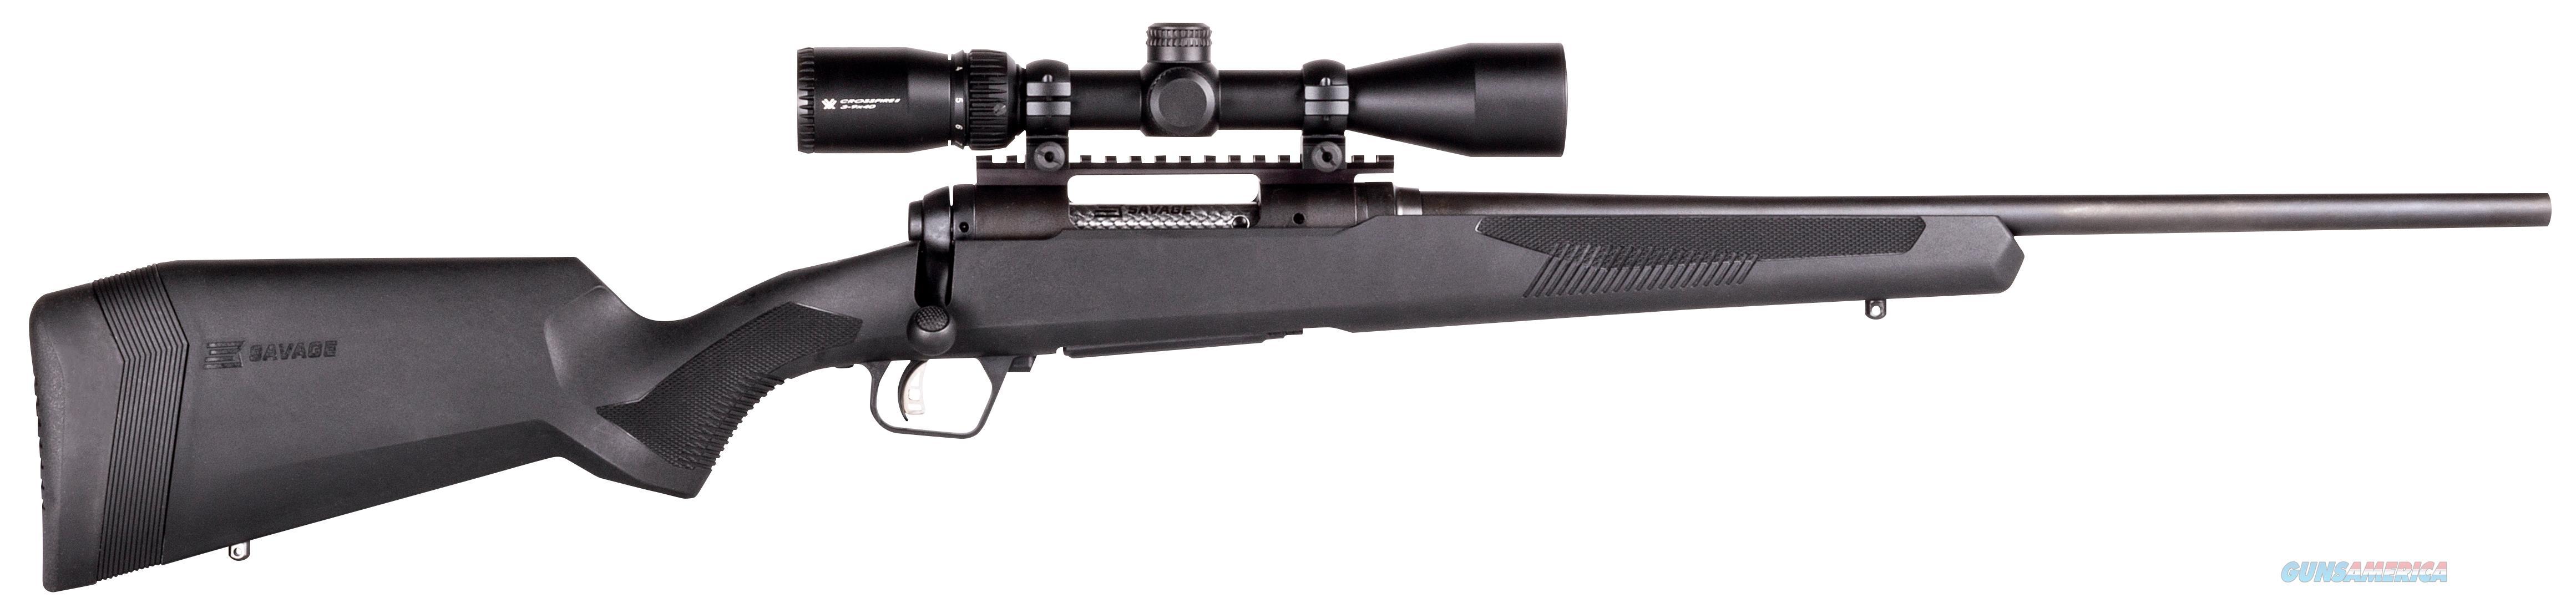 "Savage 57311 10/110 Apex Hunter XP  Bolt 6.5x284 Norma 24"" 3+1 Synthetic Black Stk Black  Guns > Rifles > S Misc Rifles"